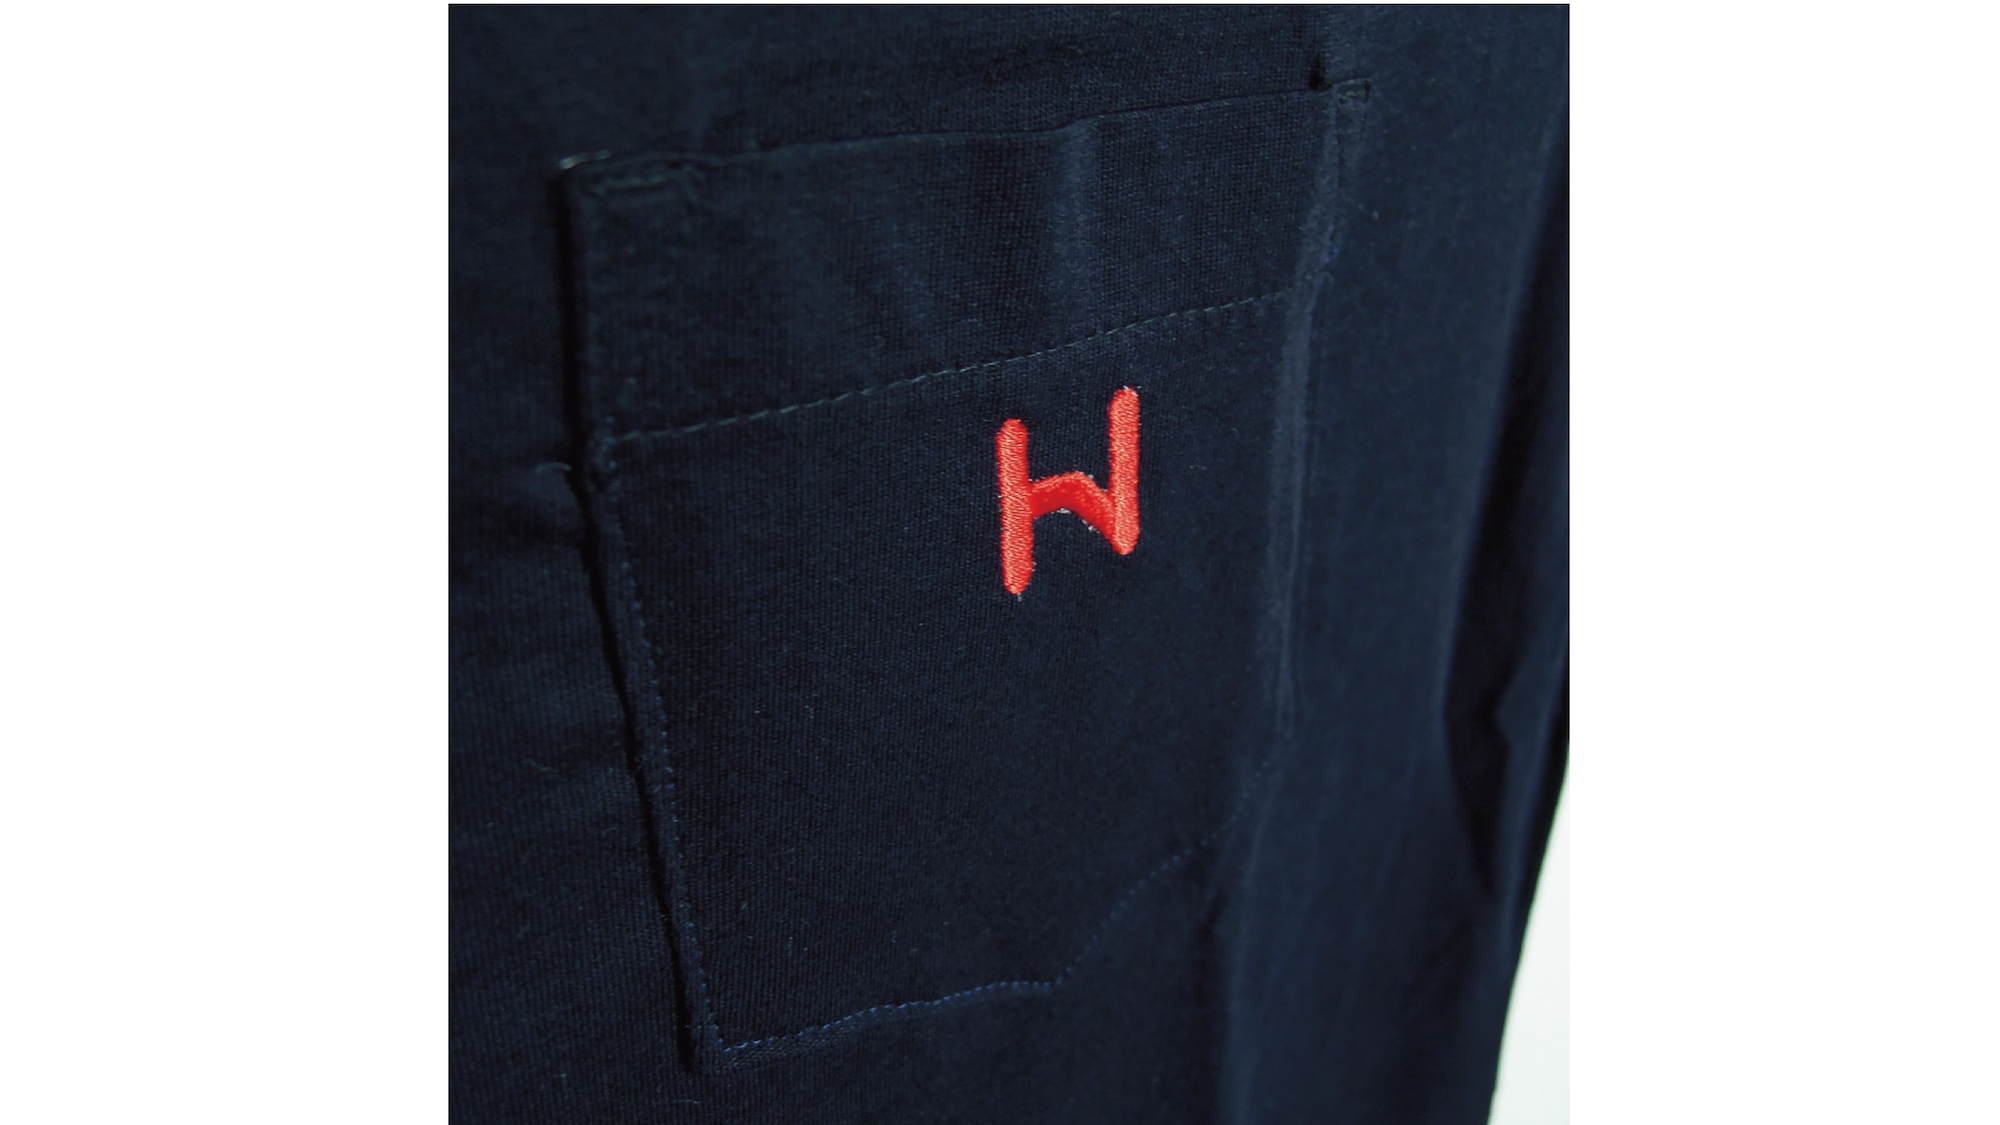 HNN ロゴTee 2.0 [Navy×Red] - 画像3